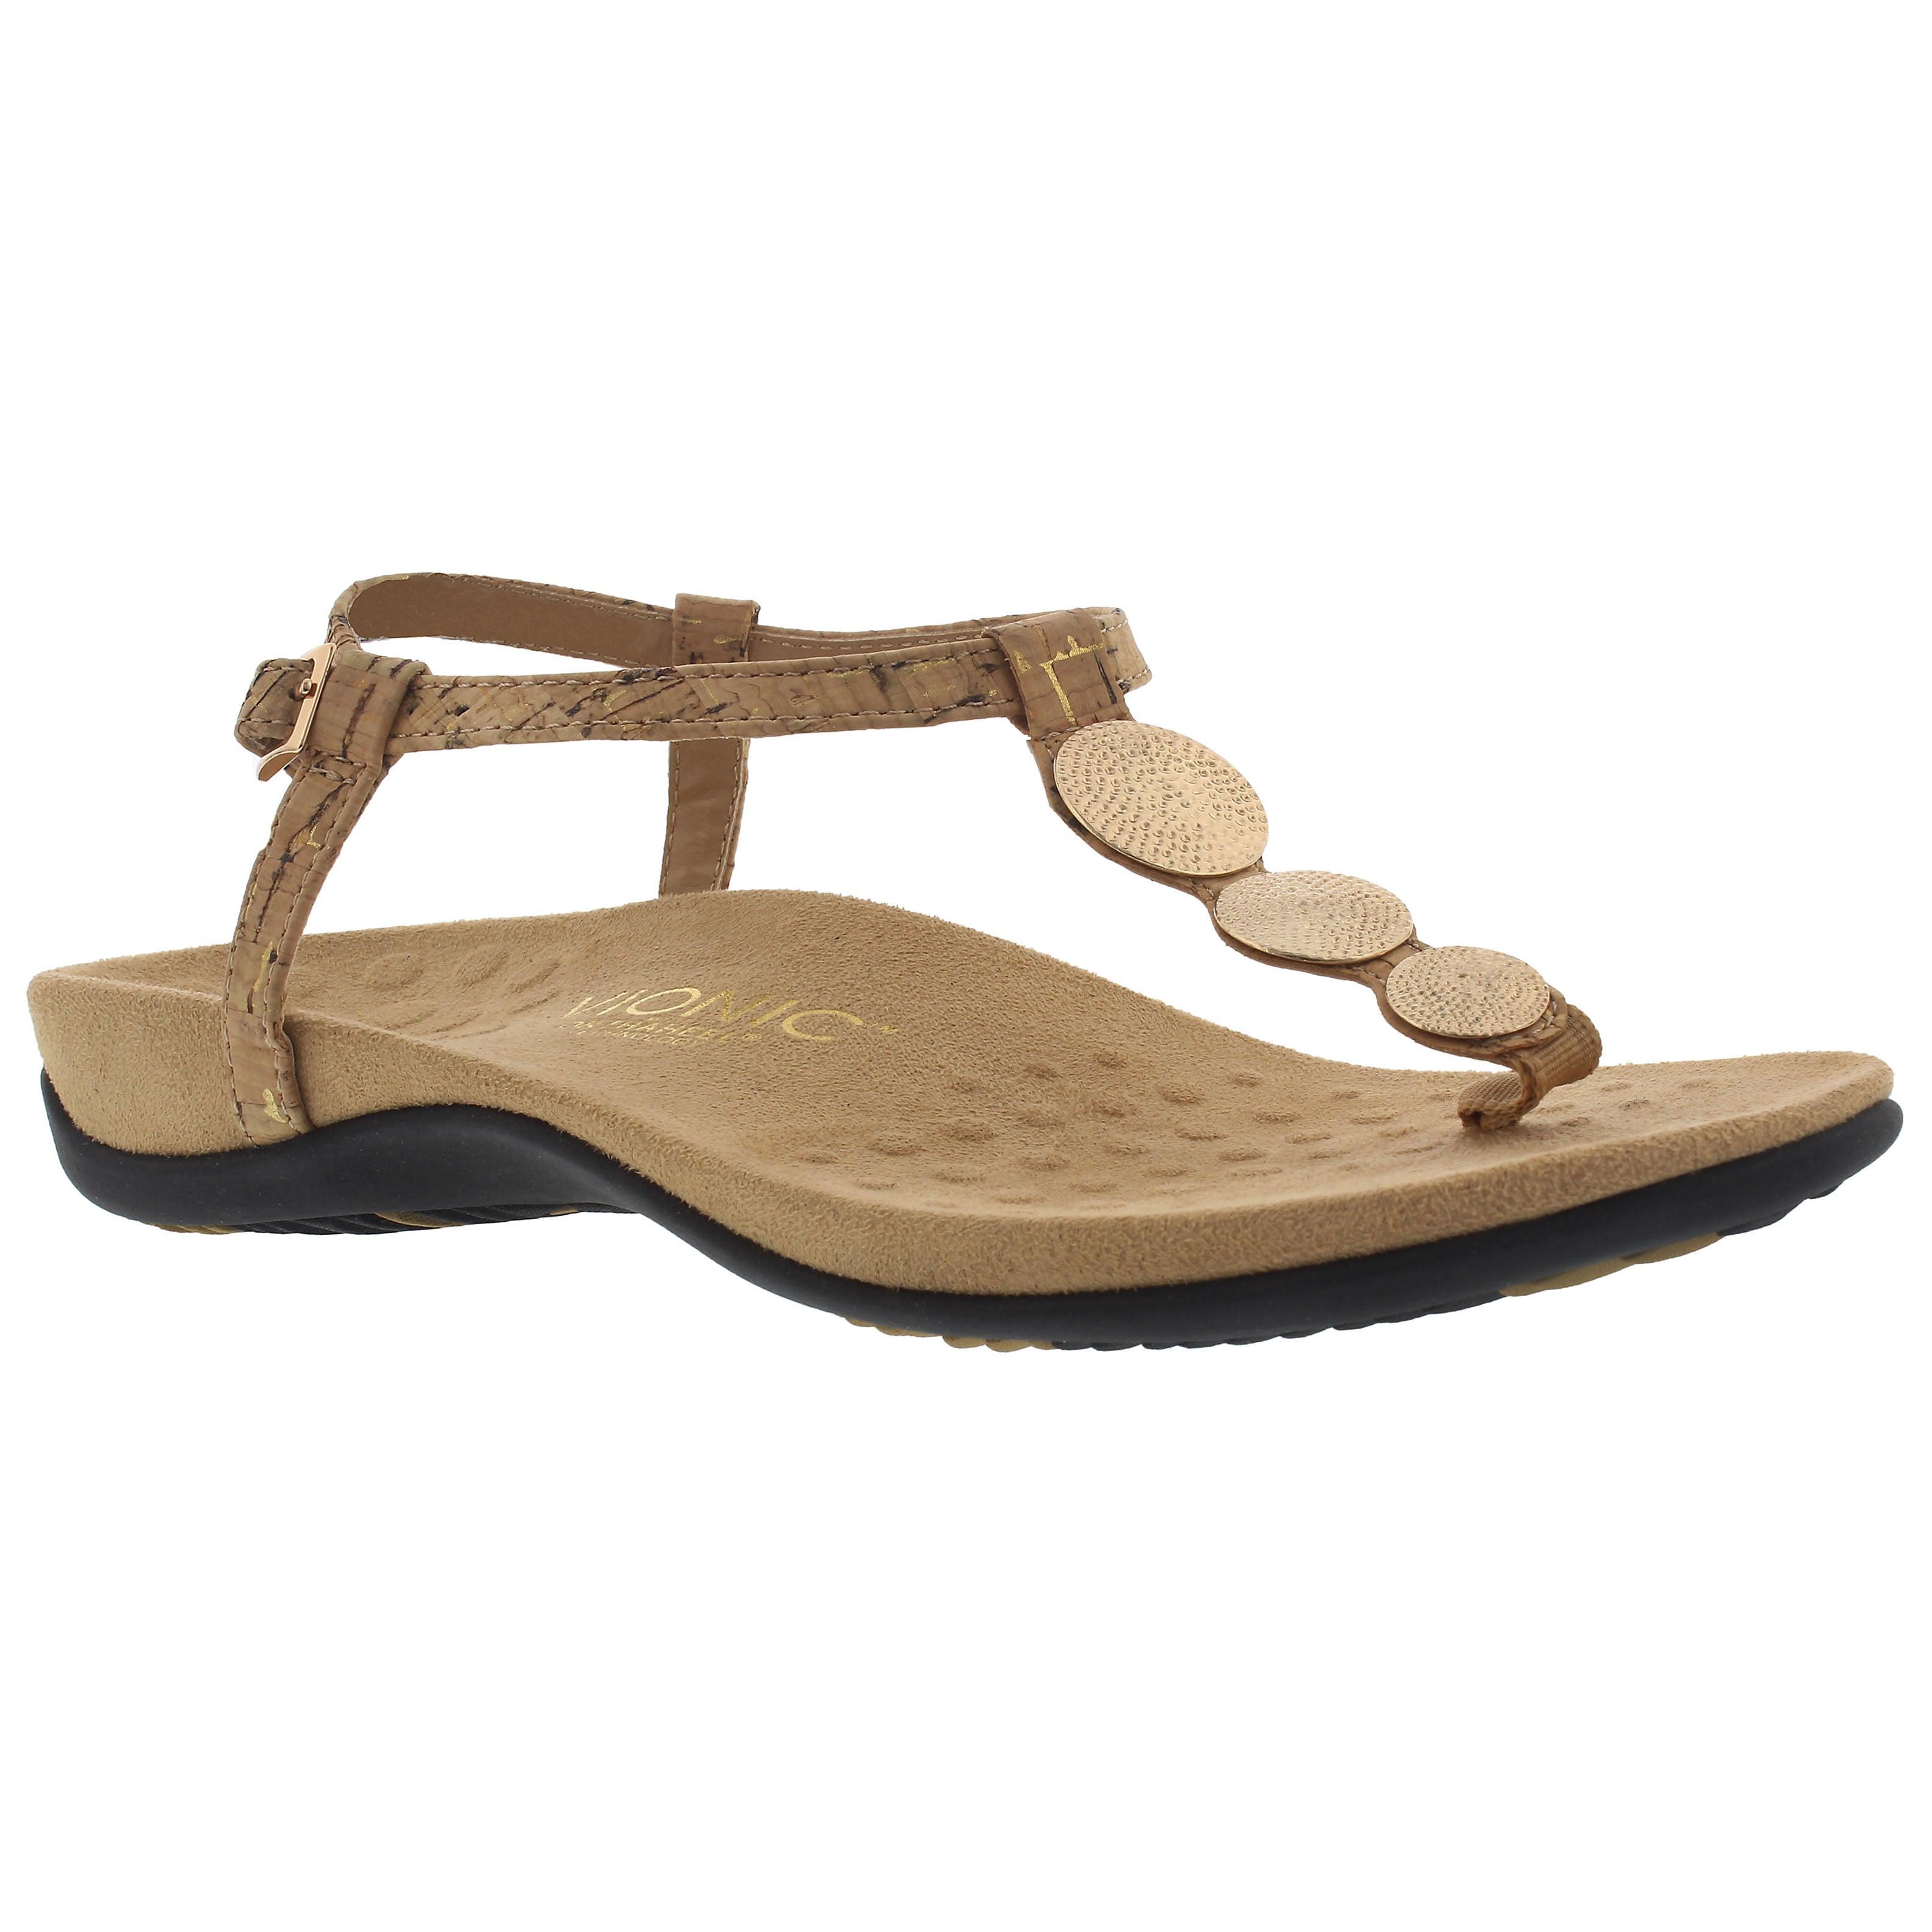 Lds Lizbeth gold arch support flip flop